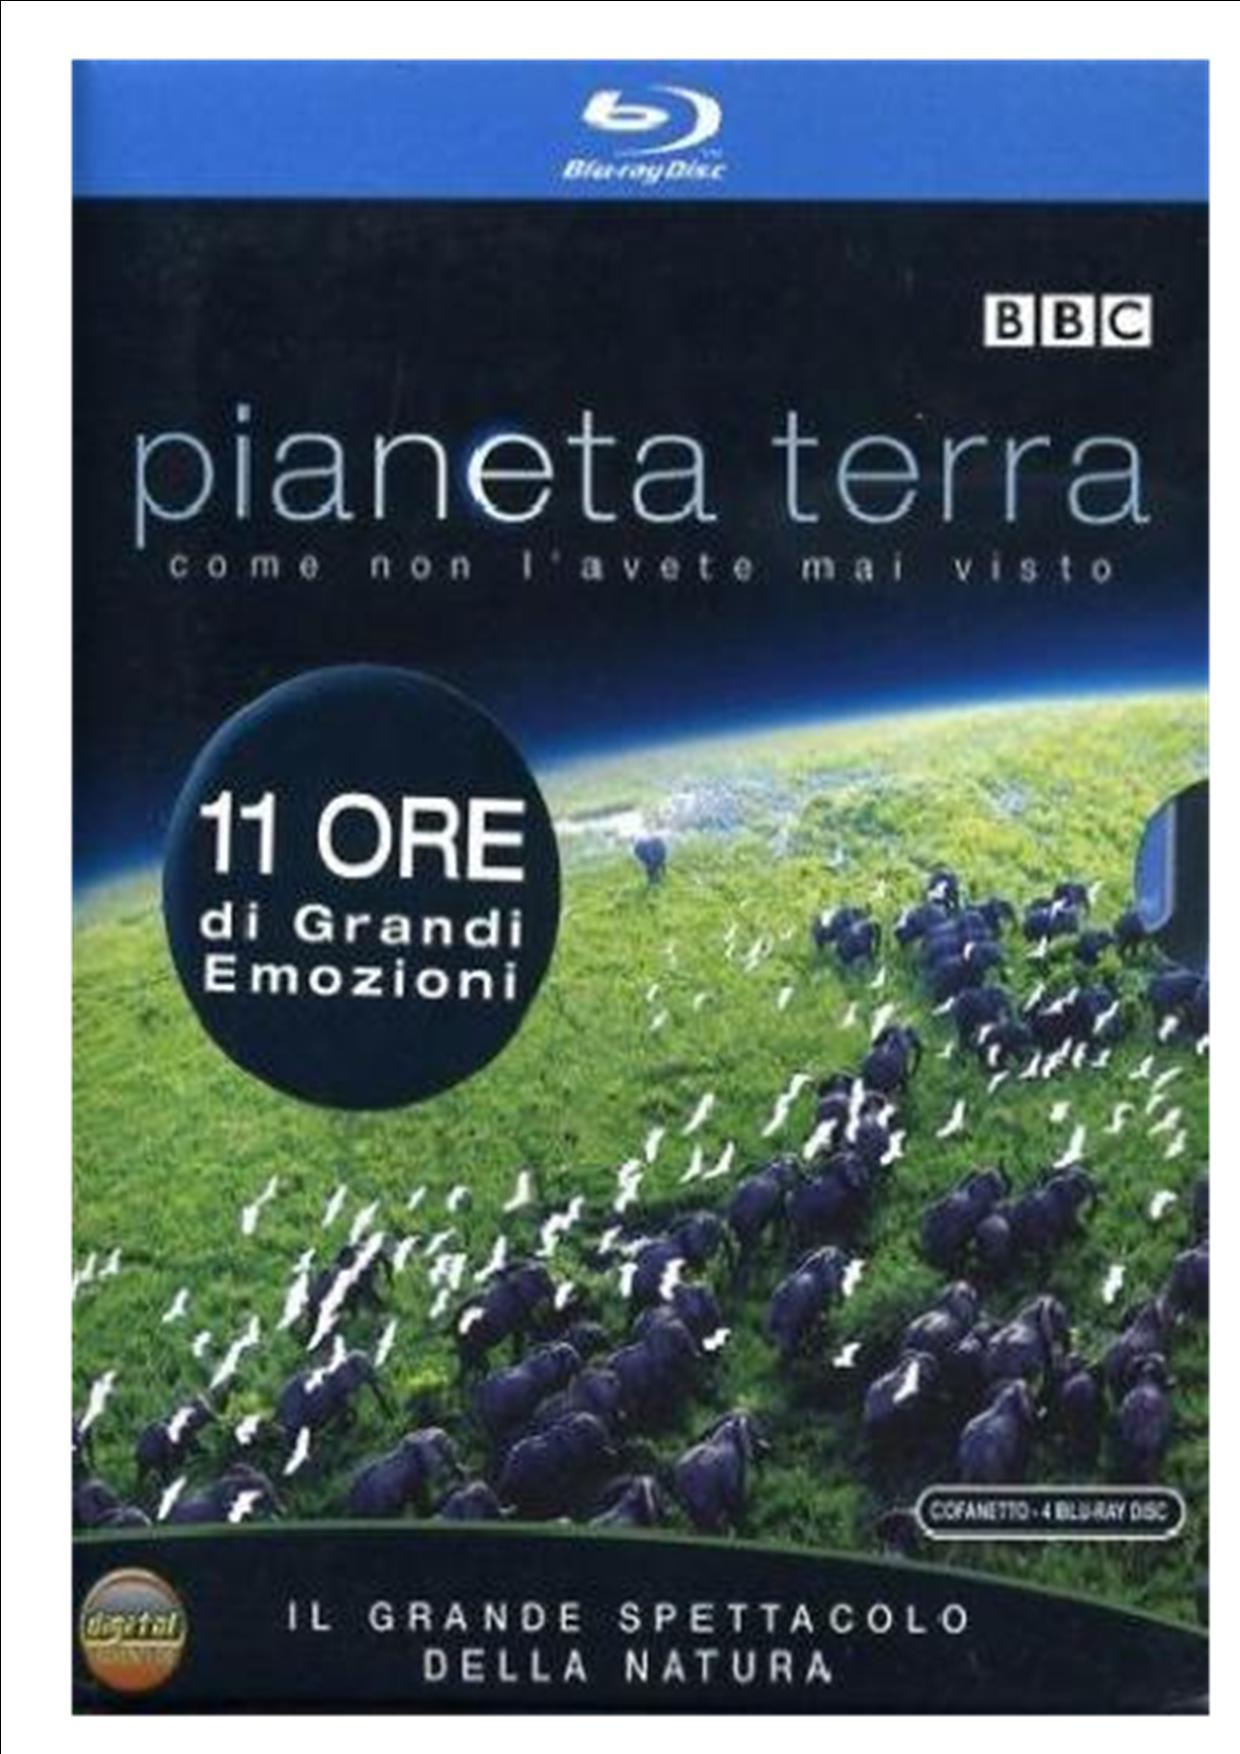 COF.PIANETA TERRA -ESENTE IVA